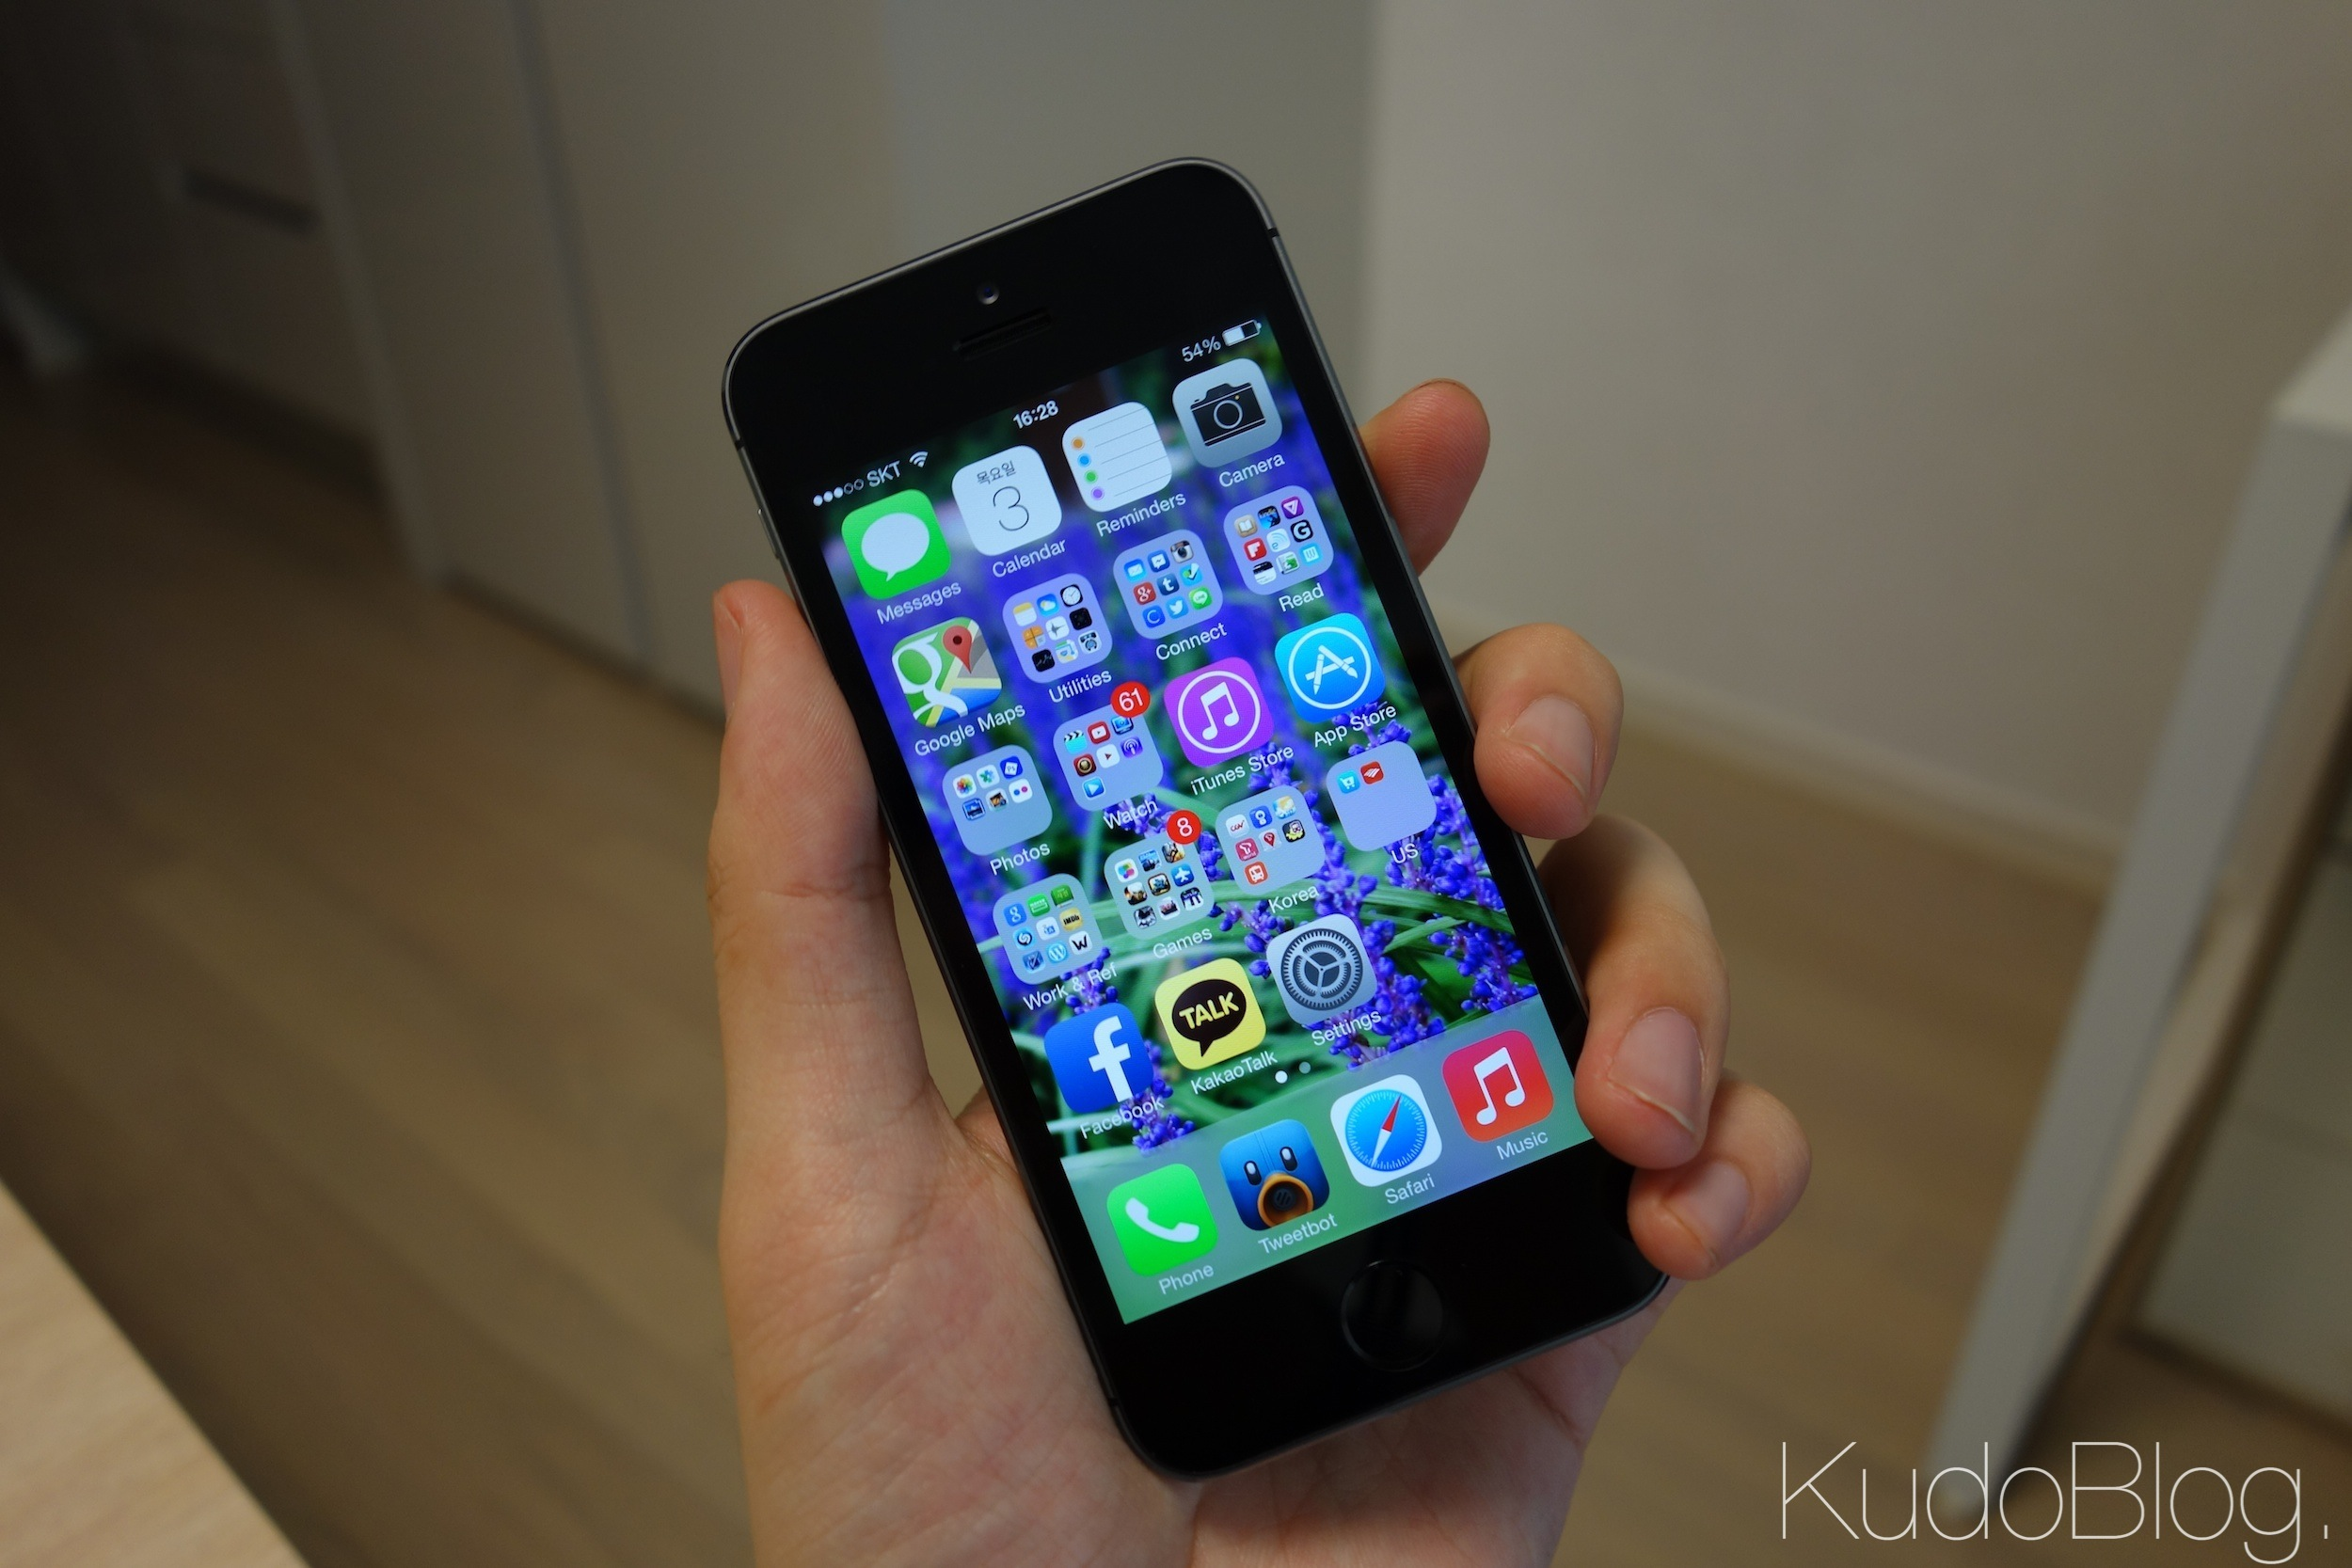 KudoReview: iOS 7